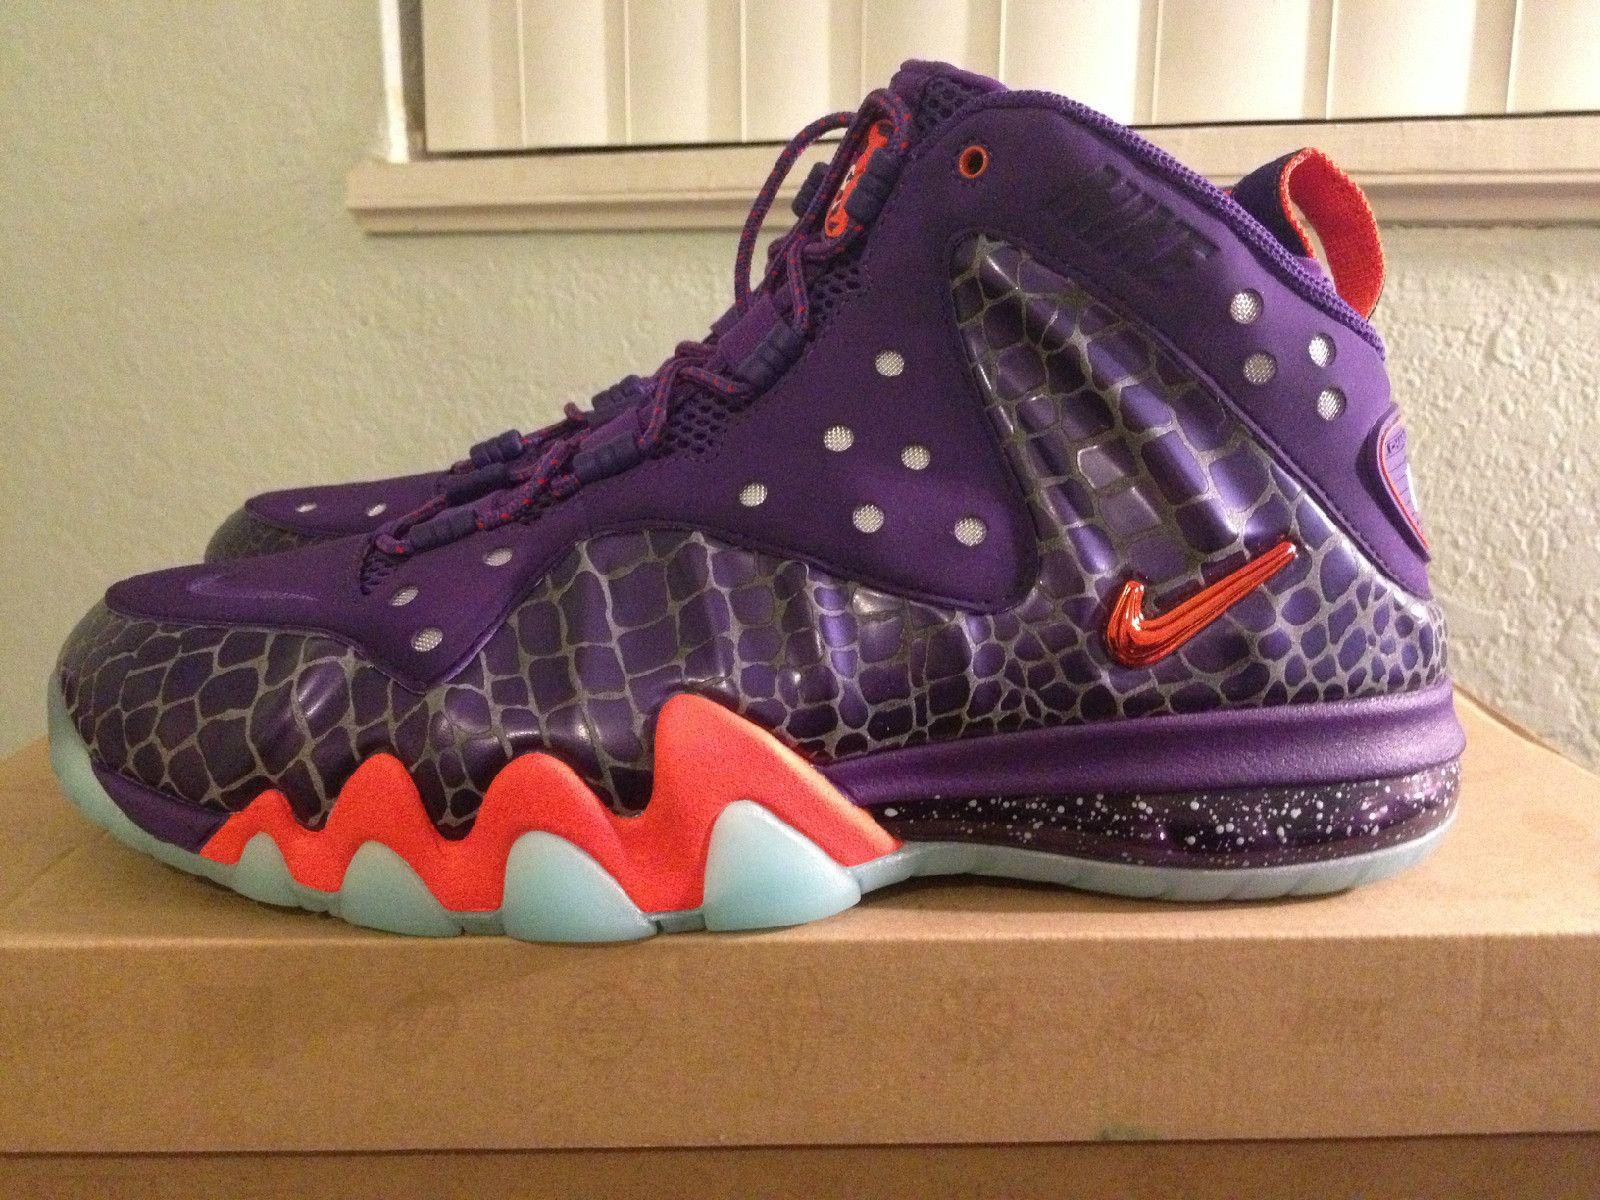 Nike-Barkley-Posite-Max-Phoenix-Sizes-11-5-15-Jordan-Lebron-Retro -6-7-2013-1- (KGrHqN 08b677f51